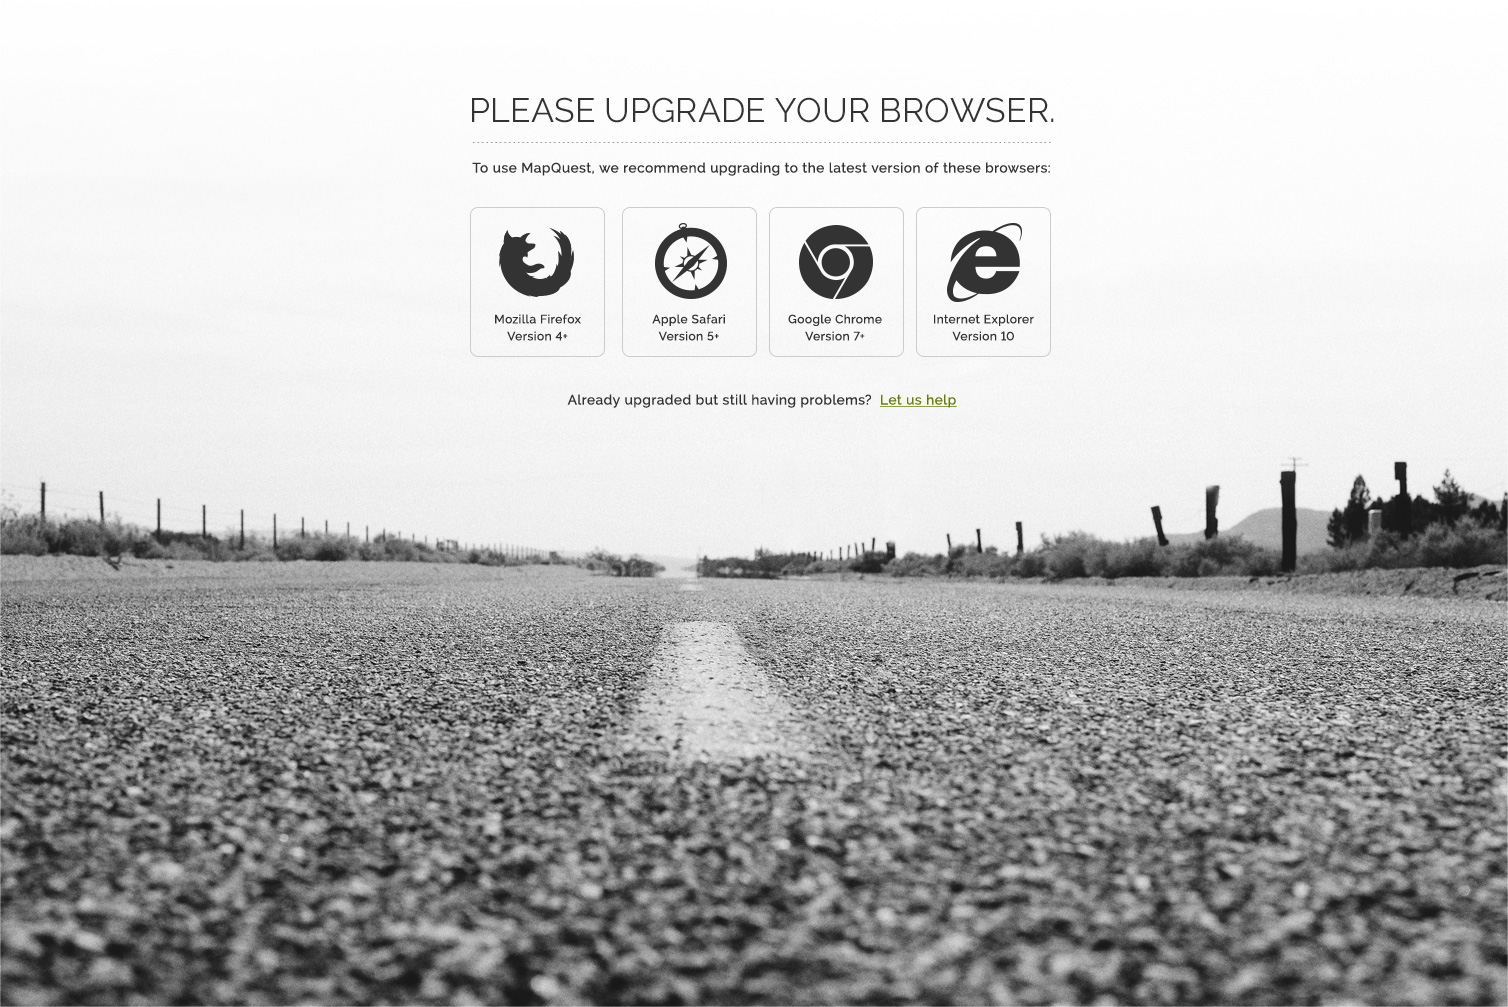 yogi_Unsupported_Browser_v1.jpg